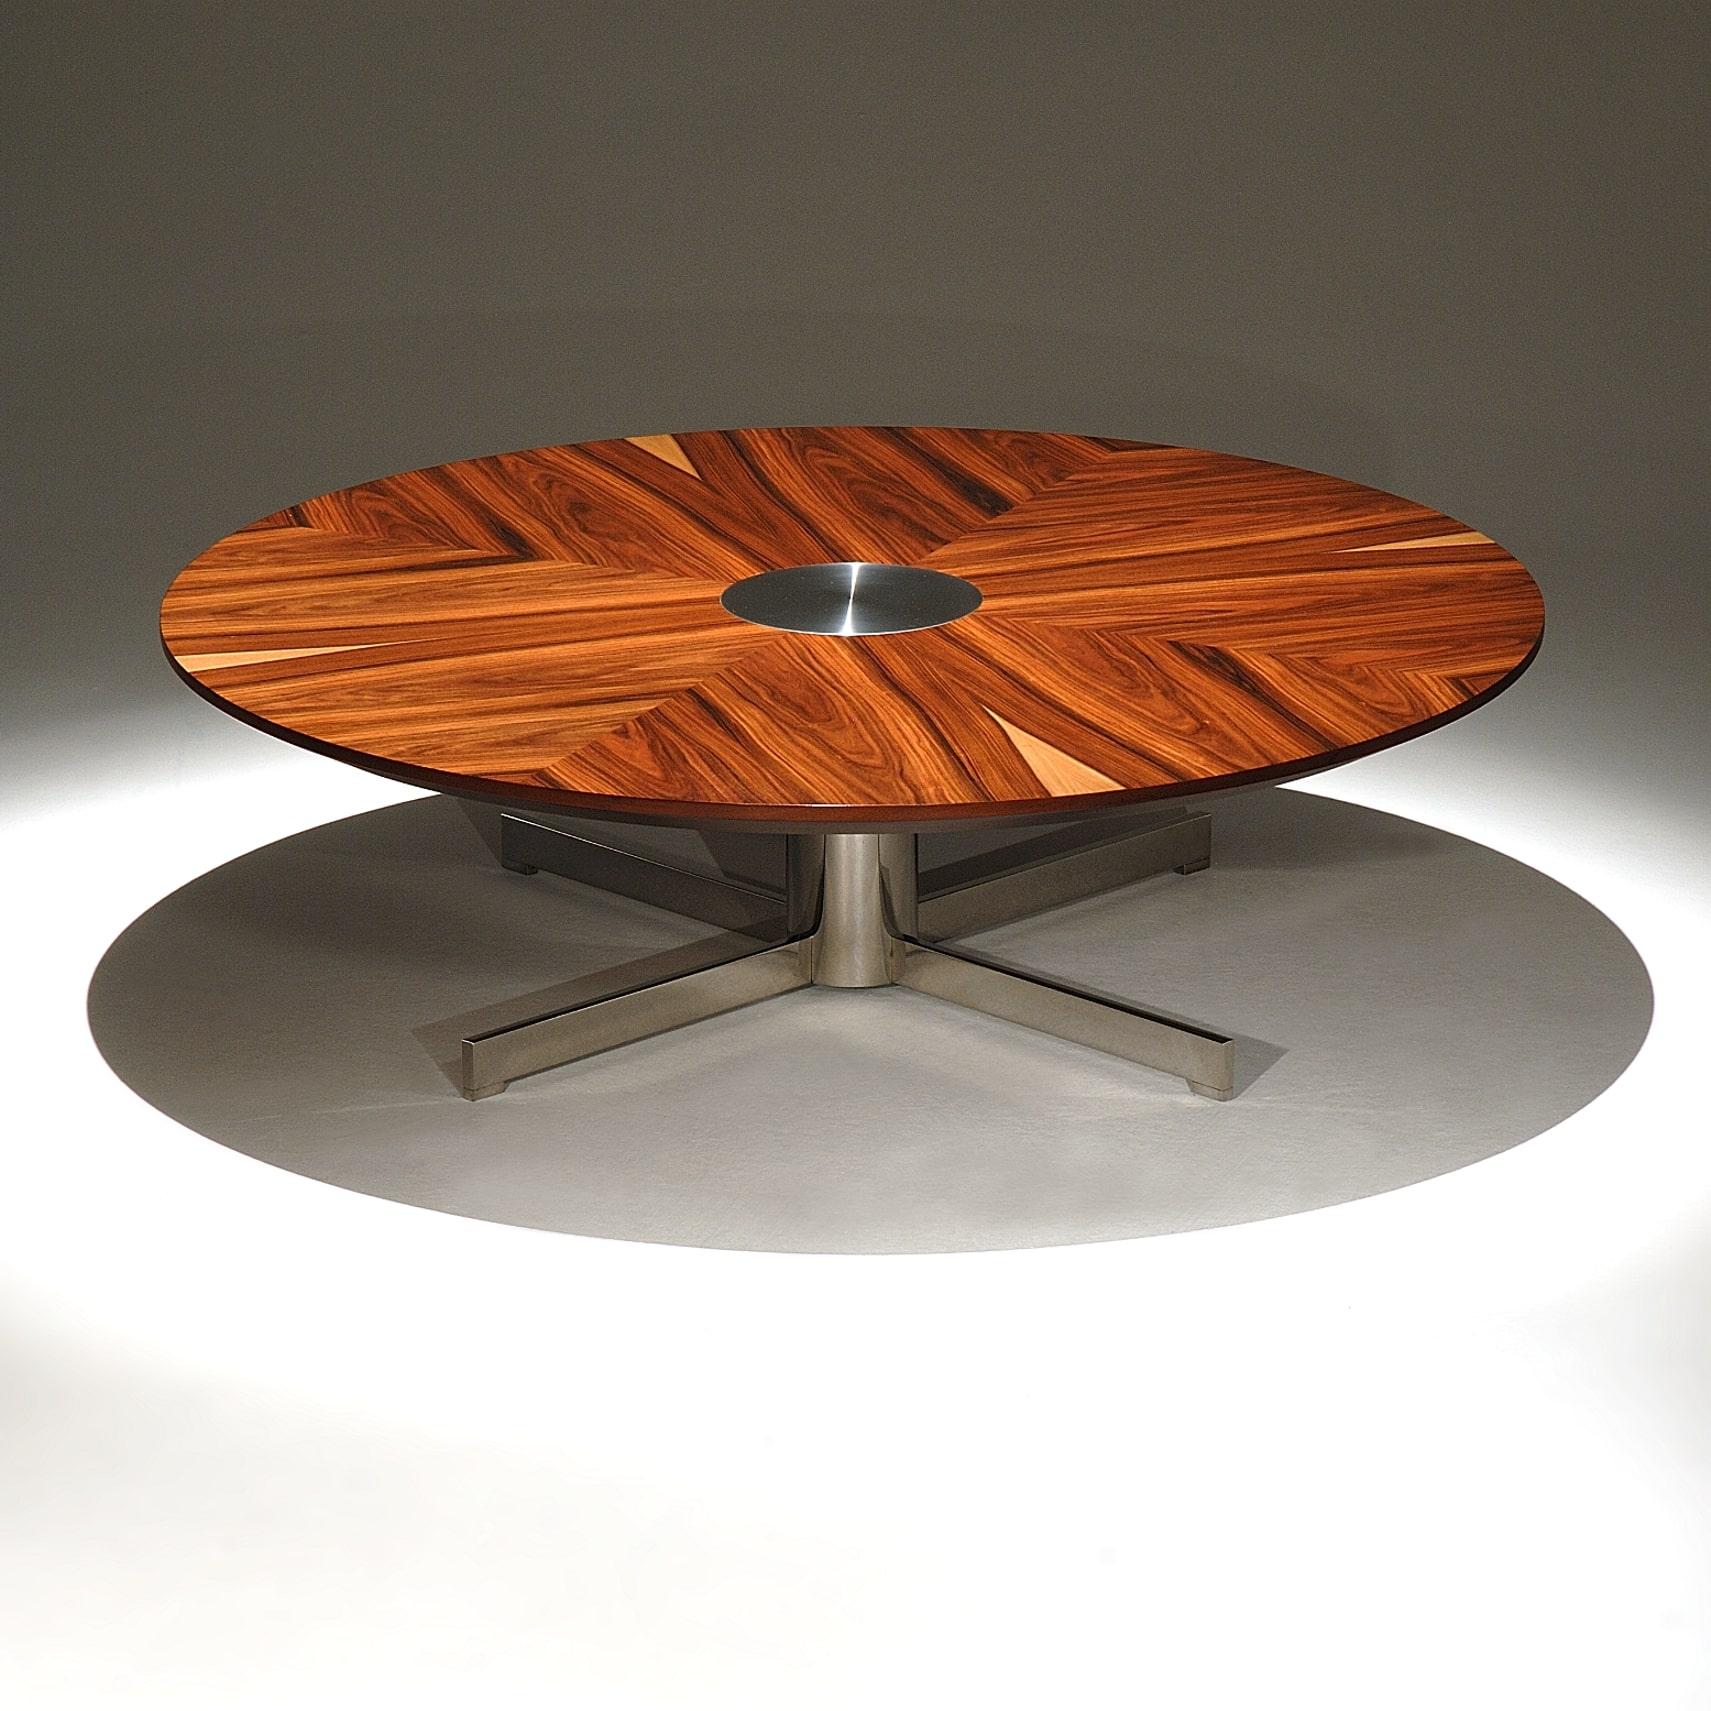 Mesa de Centro Anne Estrutura Aço Inox Studio Mais Design by Silviane Nicolato